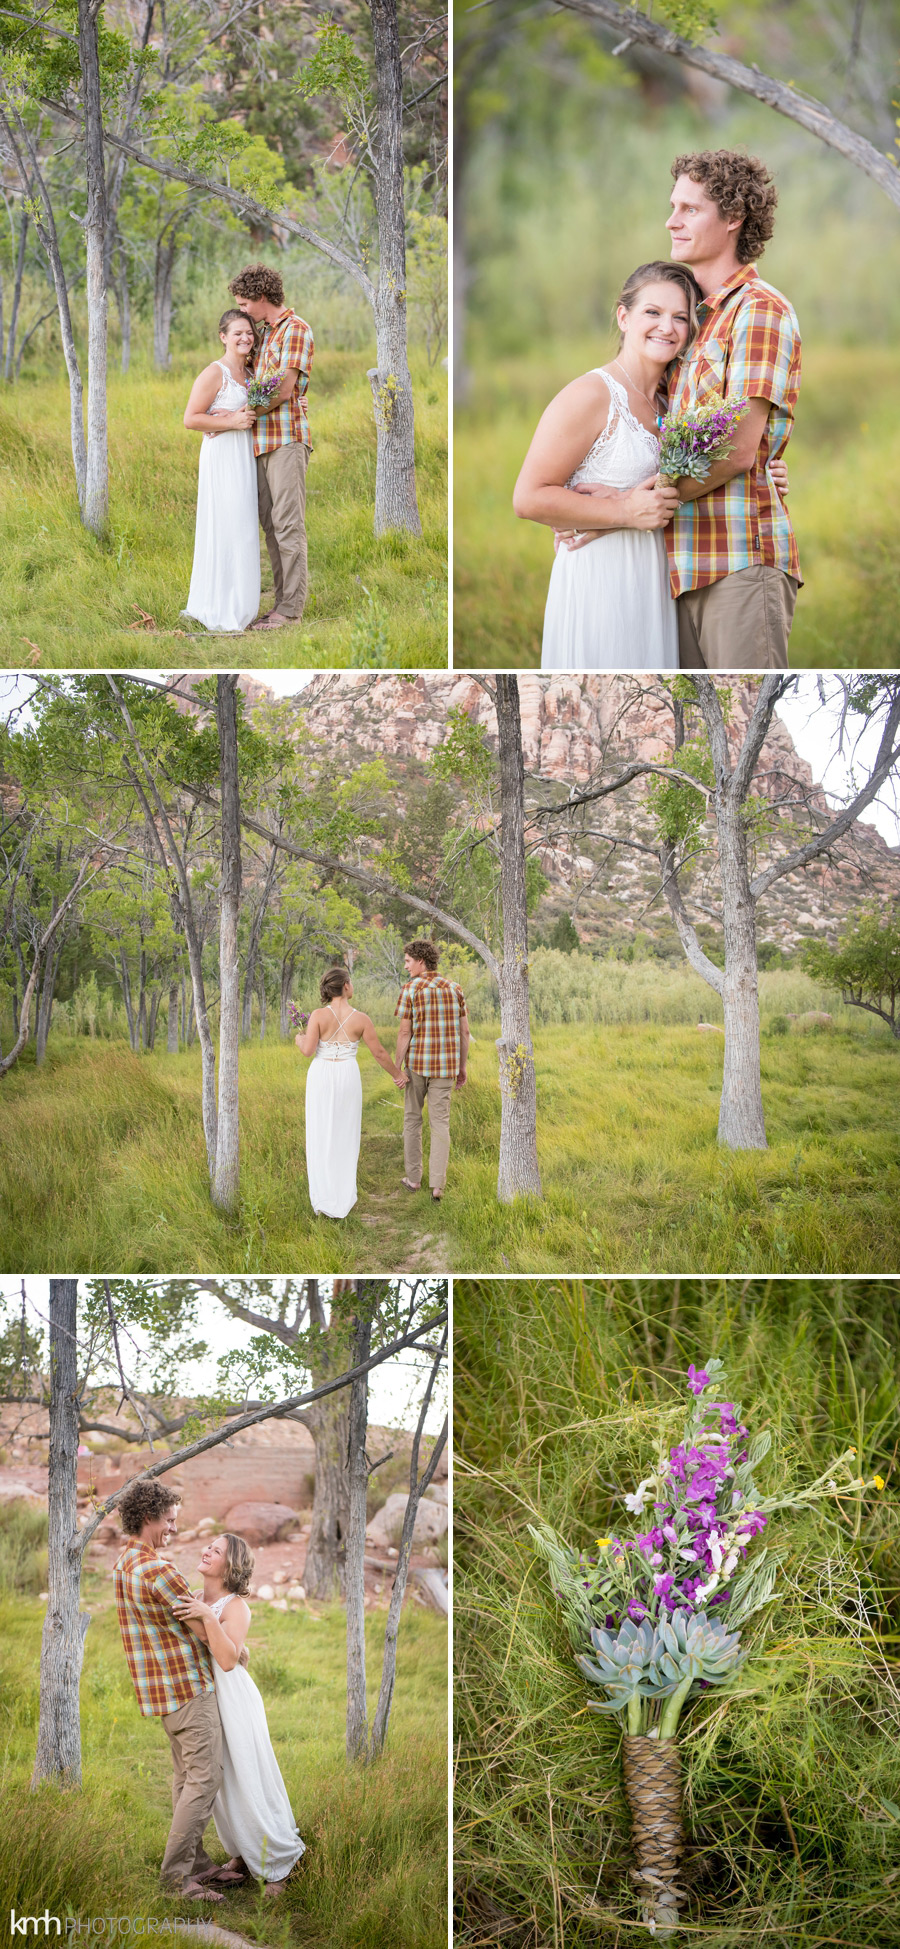 Wedding Photography Las Vegas Nevada: Nevada Desert Elopement